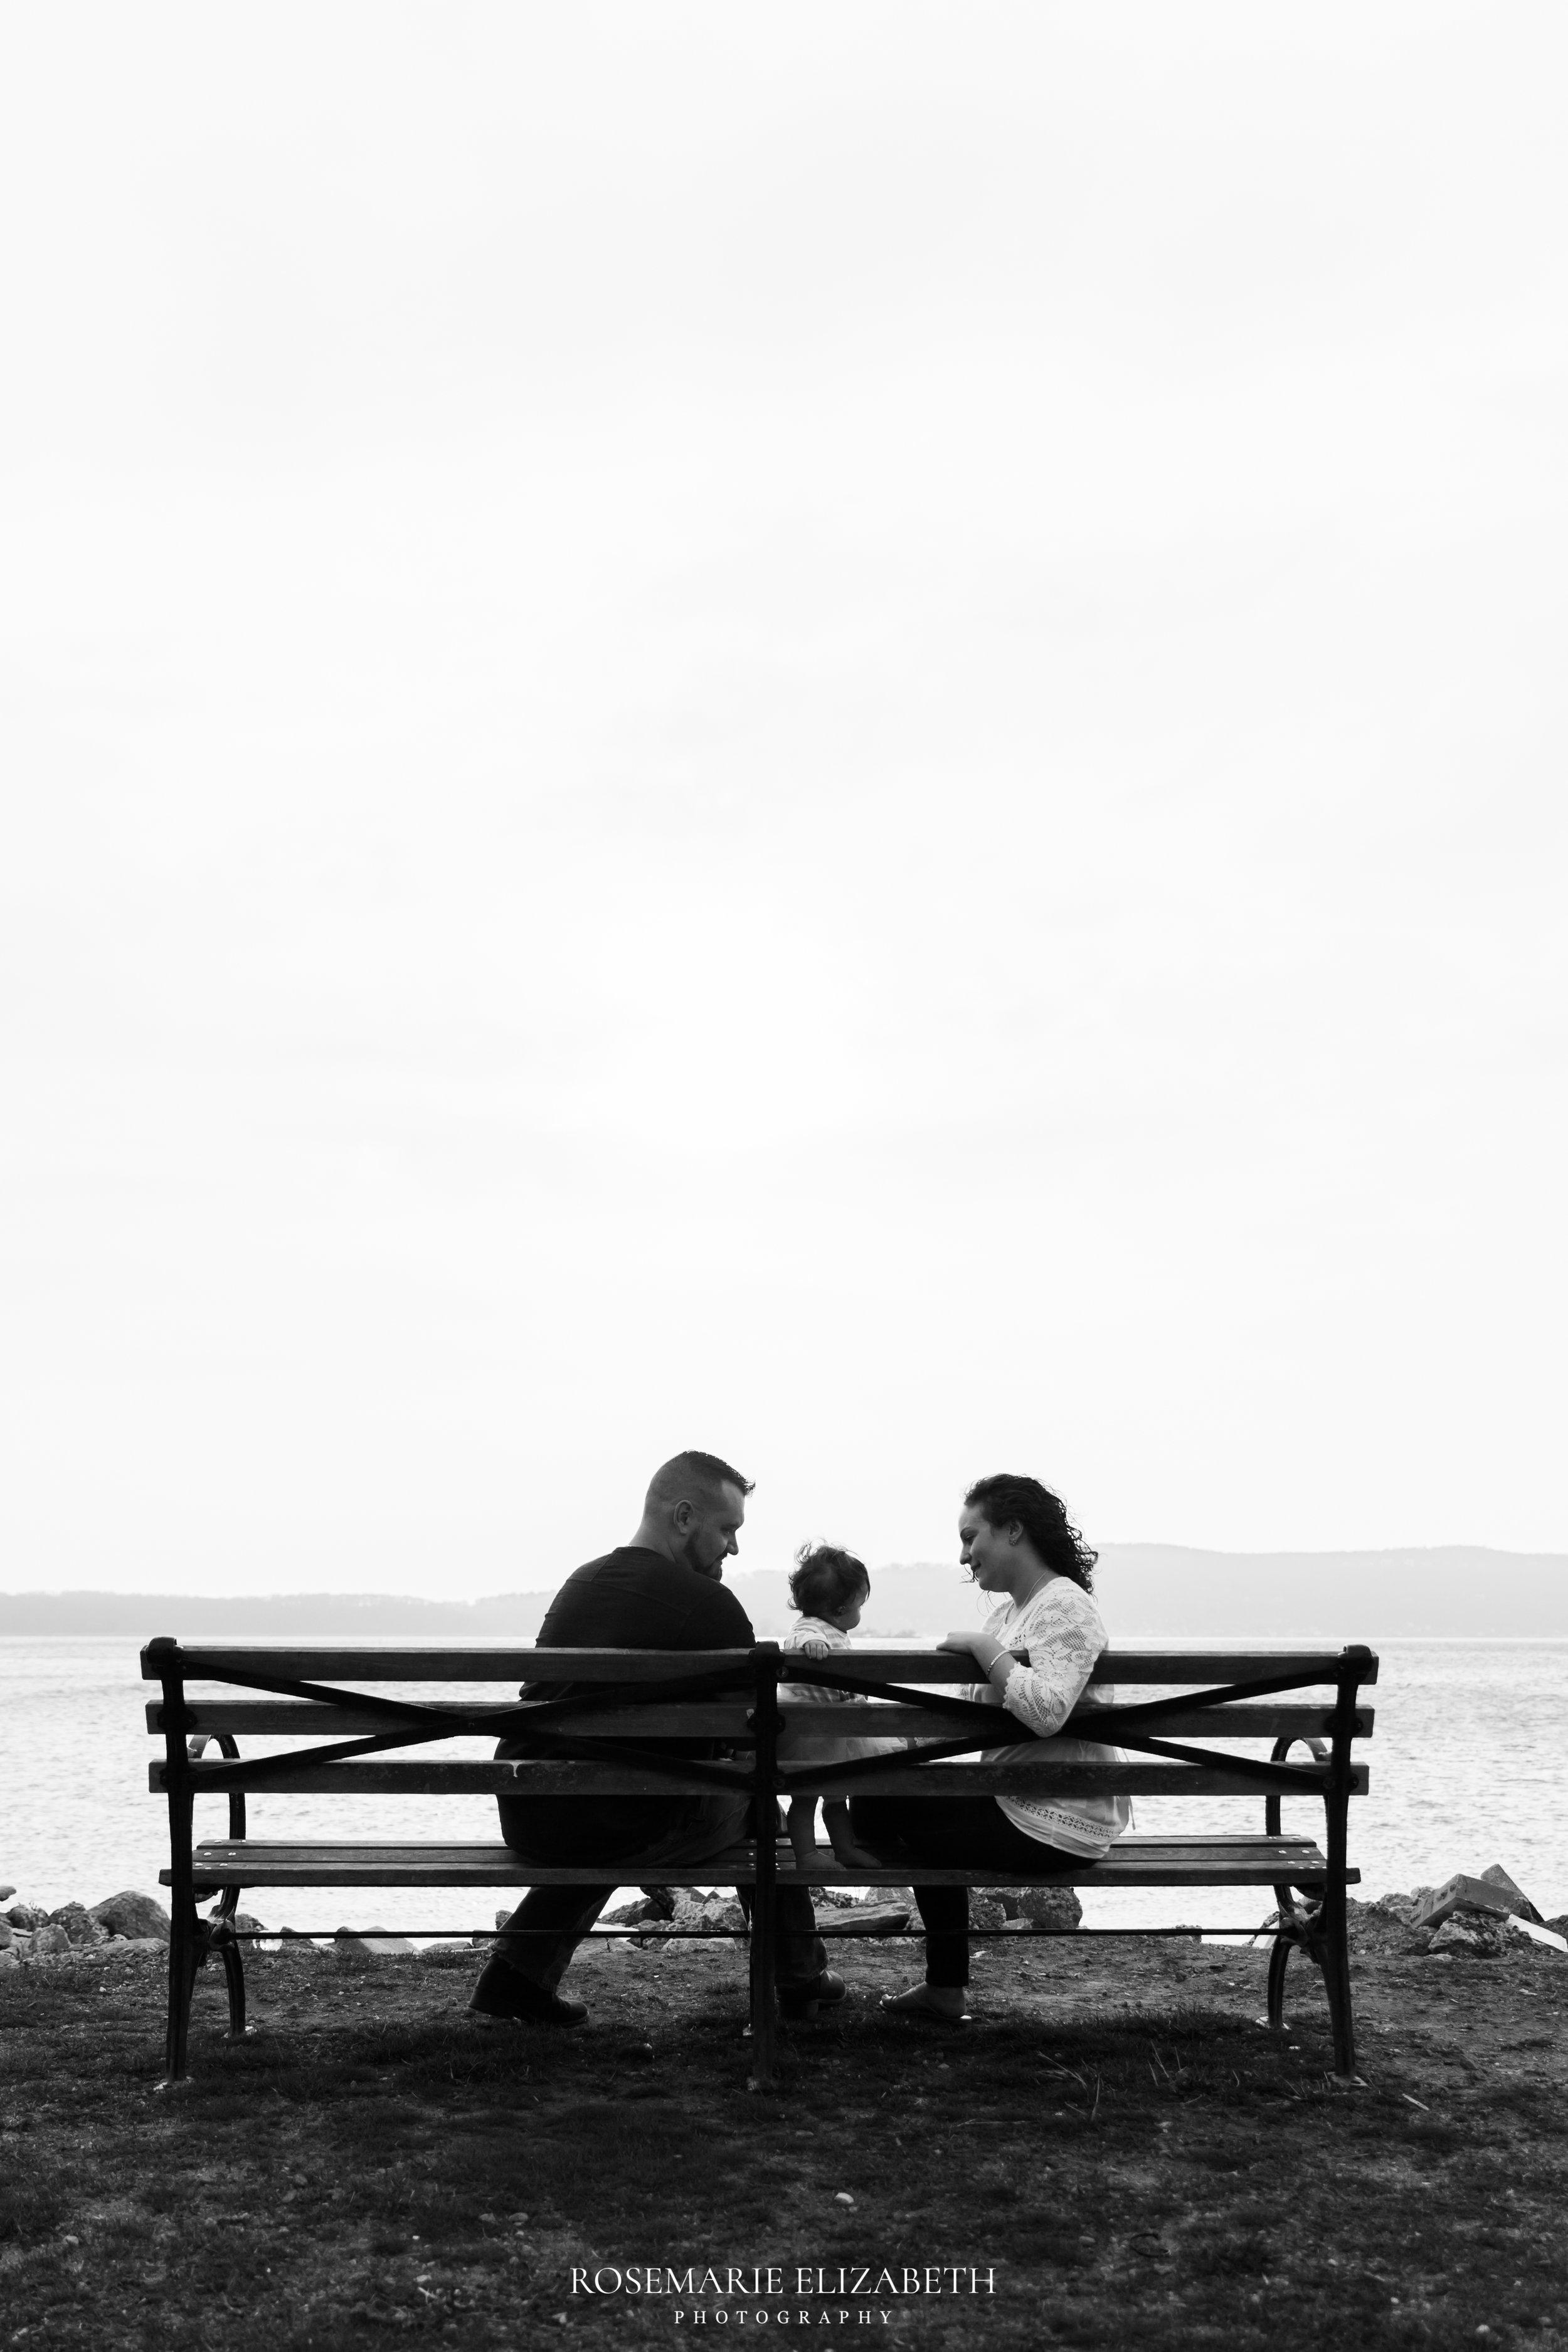 Rosemarie Elizabeth Photography-9477.jpg